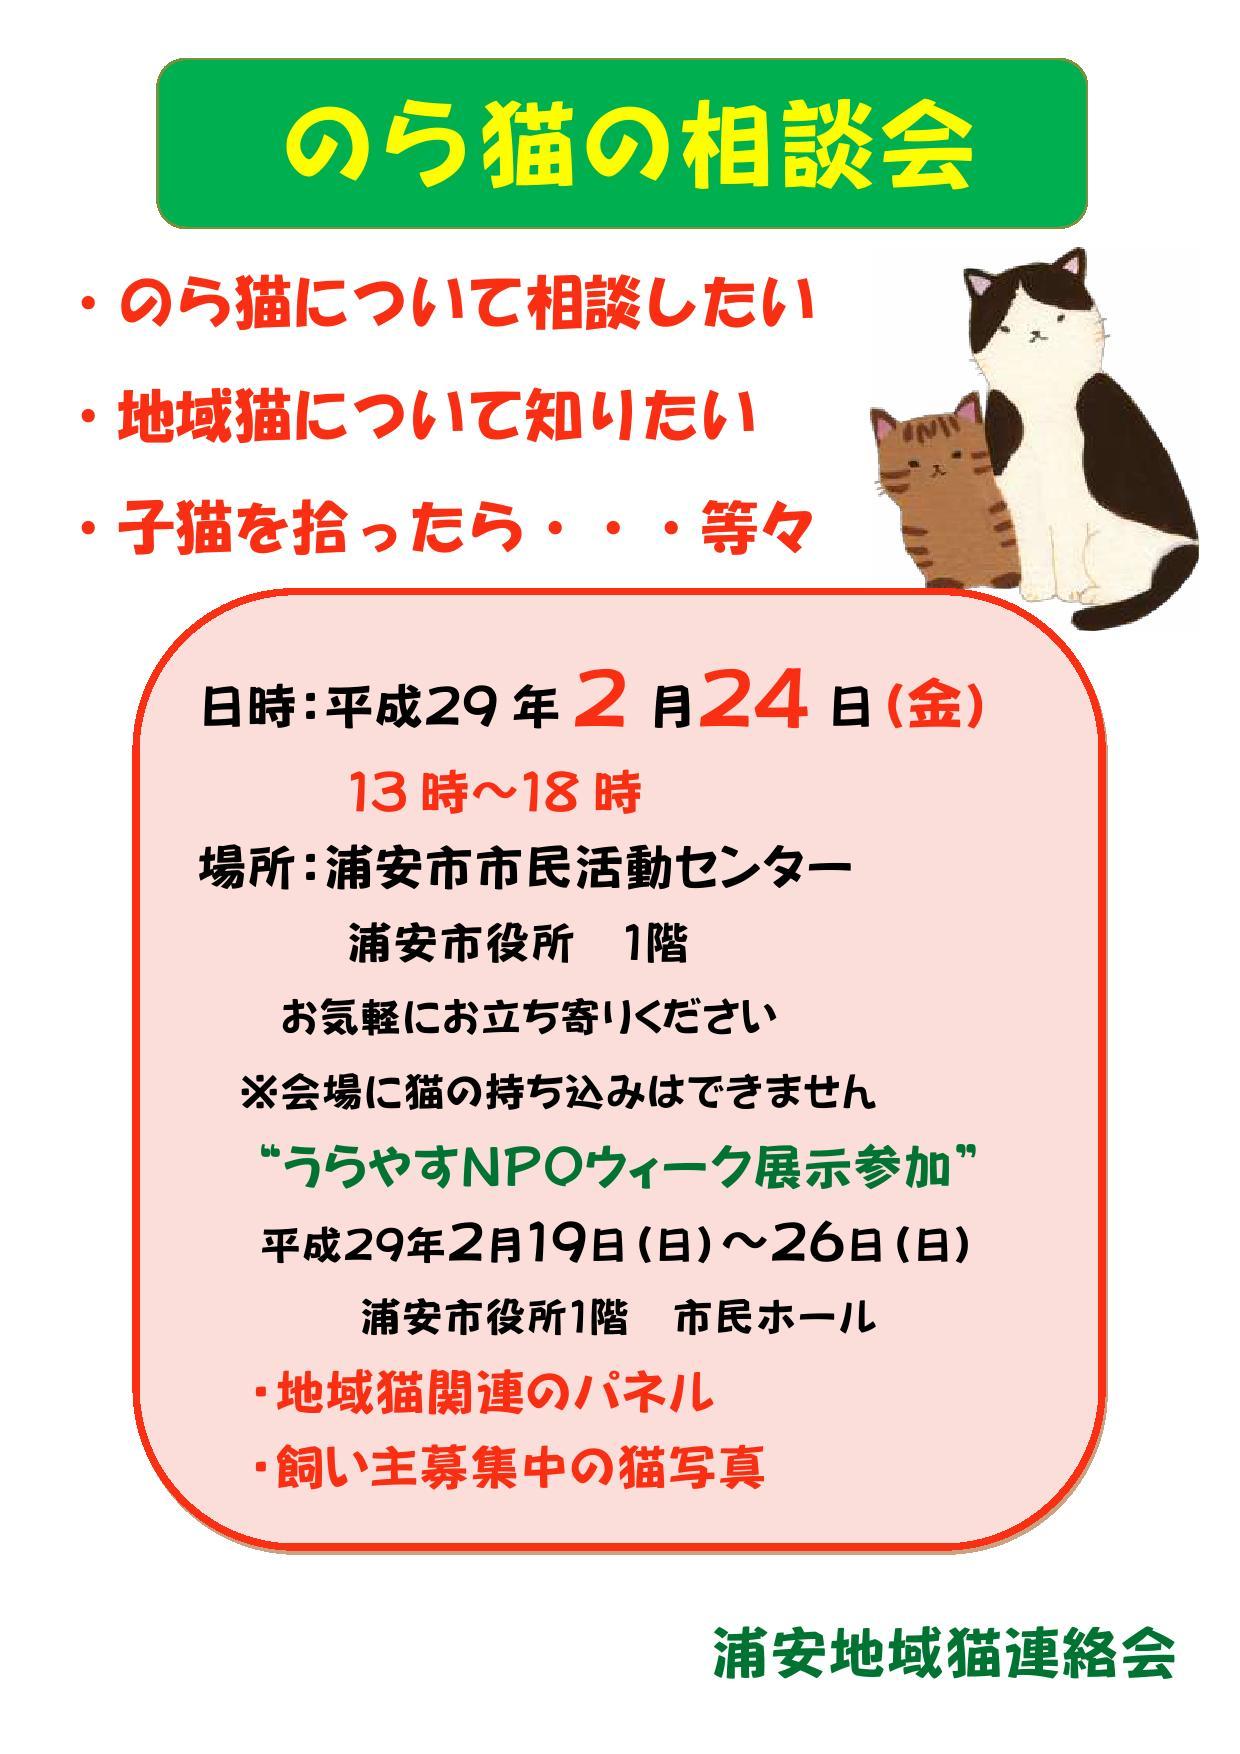 20170212193325ccb.jpg